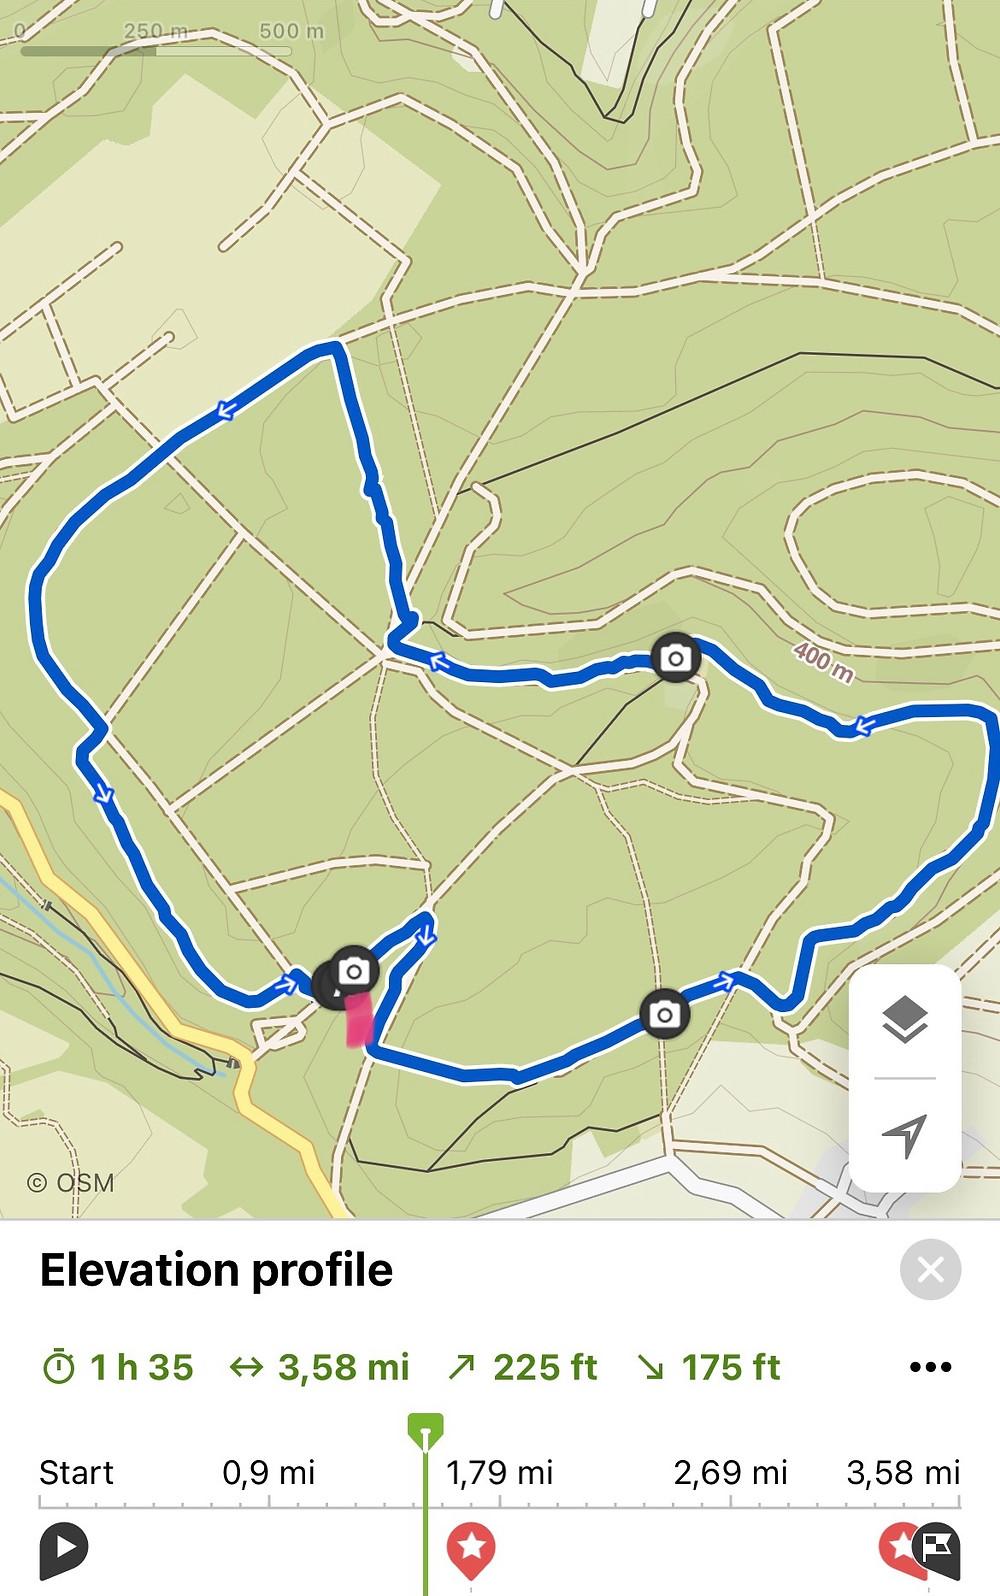 Käfer Safari Hike in Bruchmülbach-Miesau Map and Trail Guide